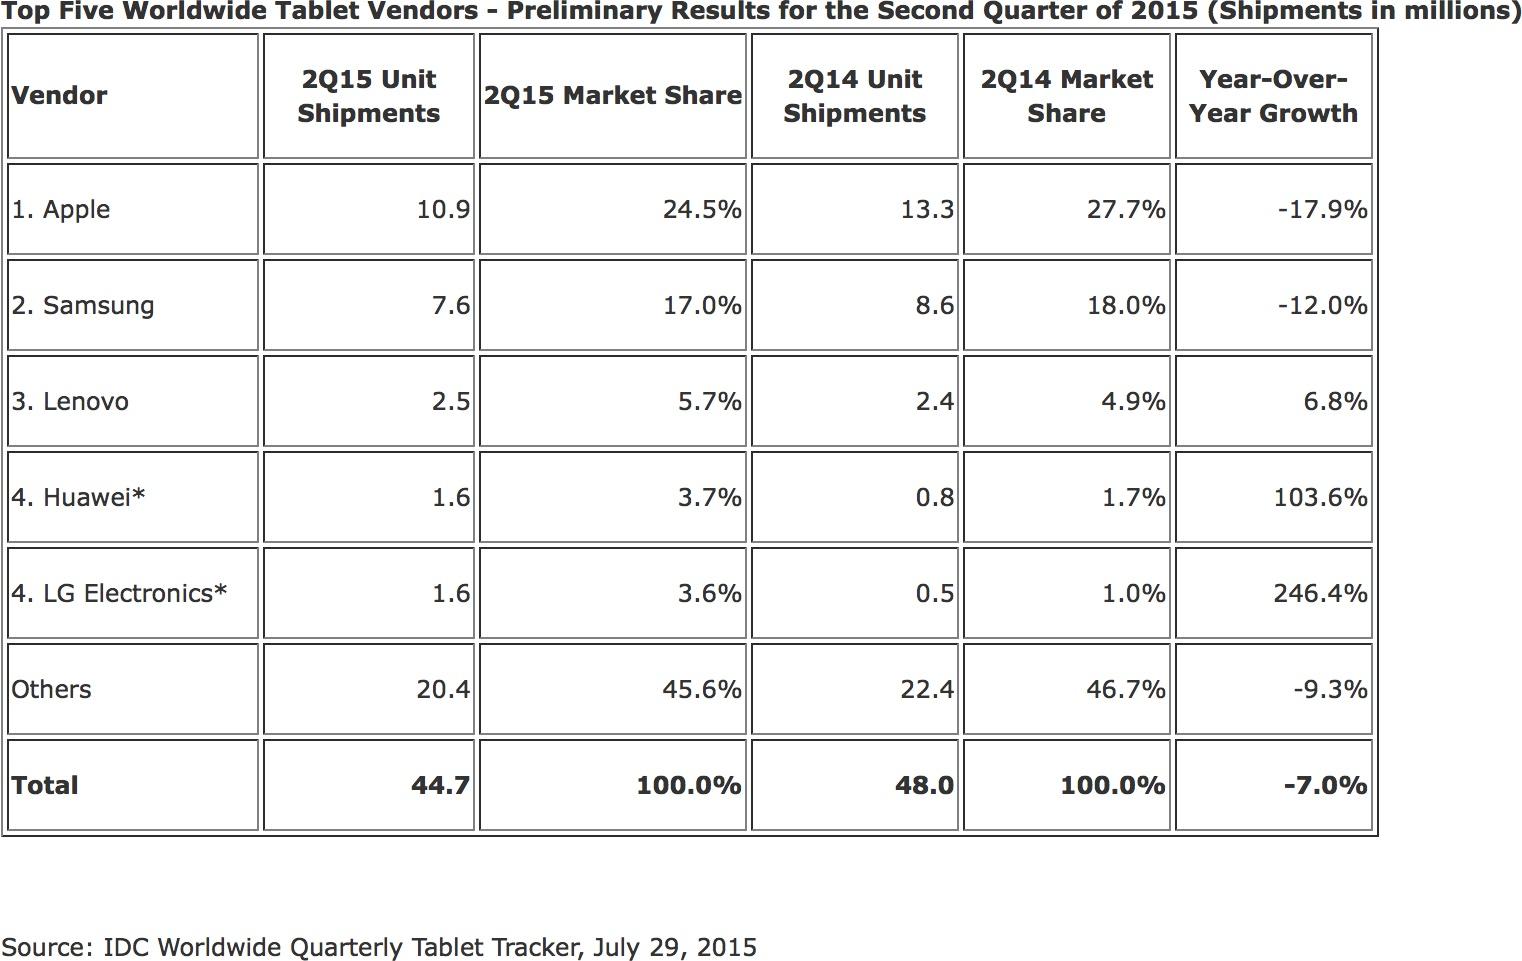 Pesquisa sobre vendas de tablets (Q2 2015)